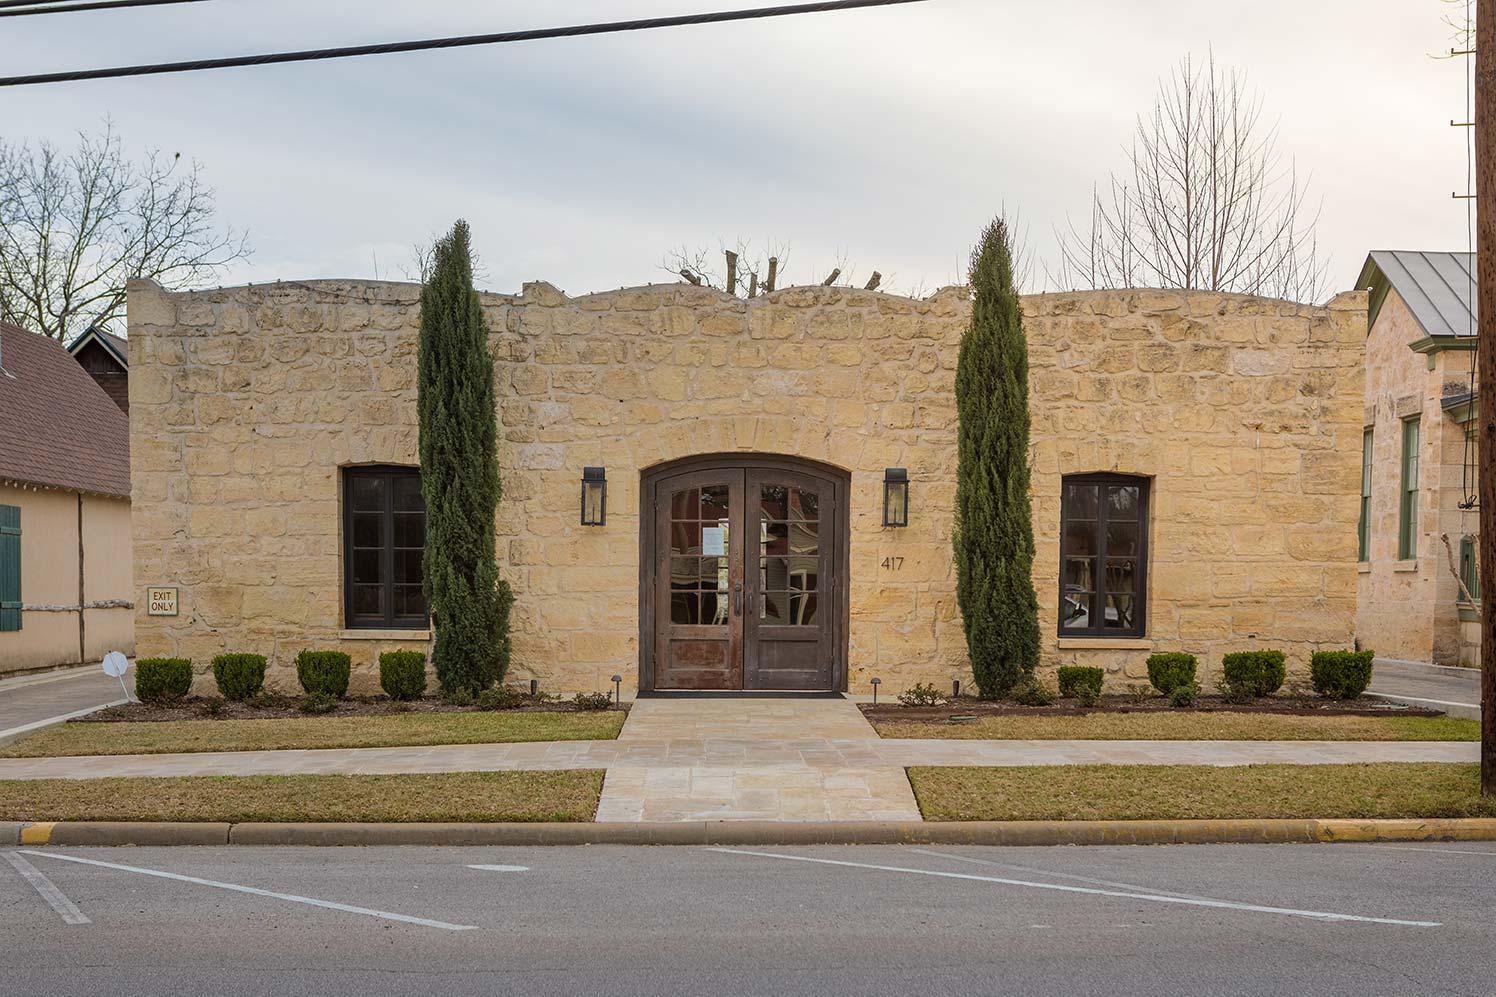 blacksmith-quarters-fredericksburg-realty-texas-commercial-real-estate-for-sale.jpg